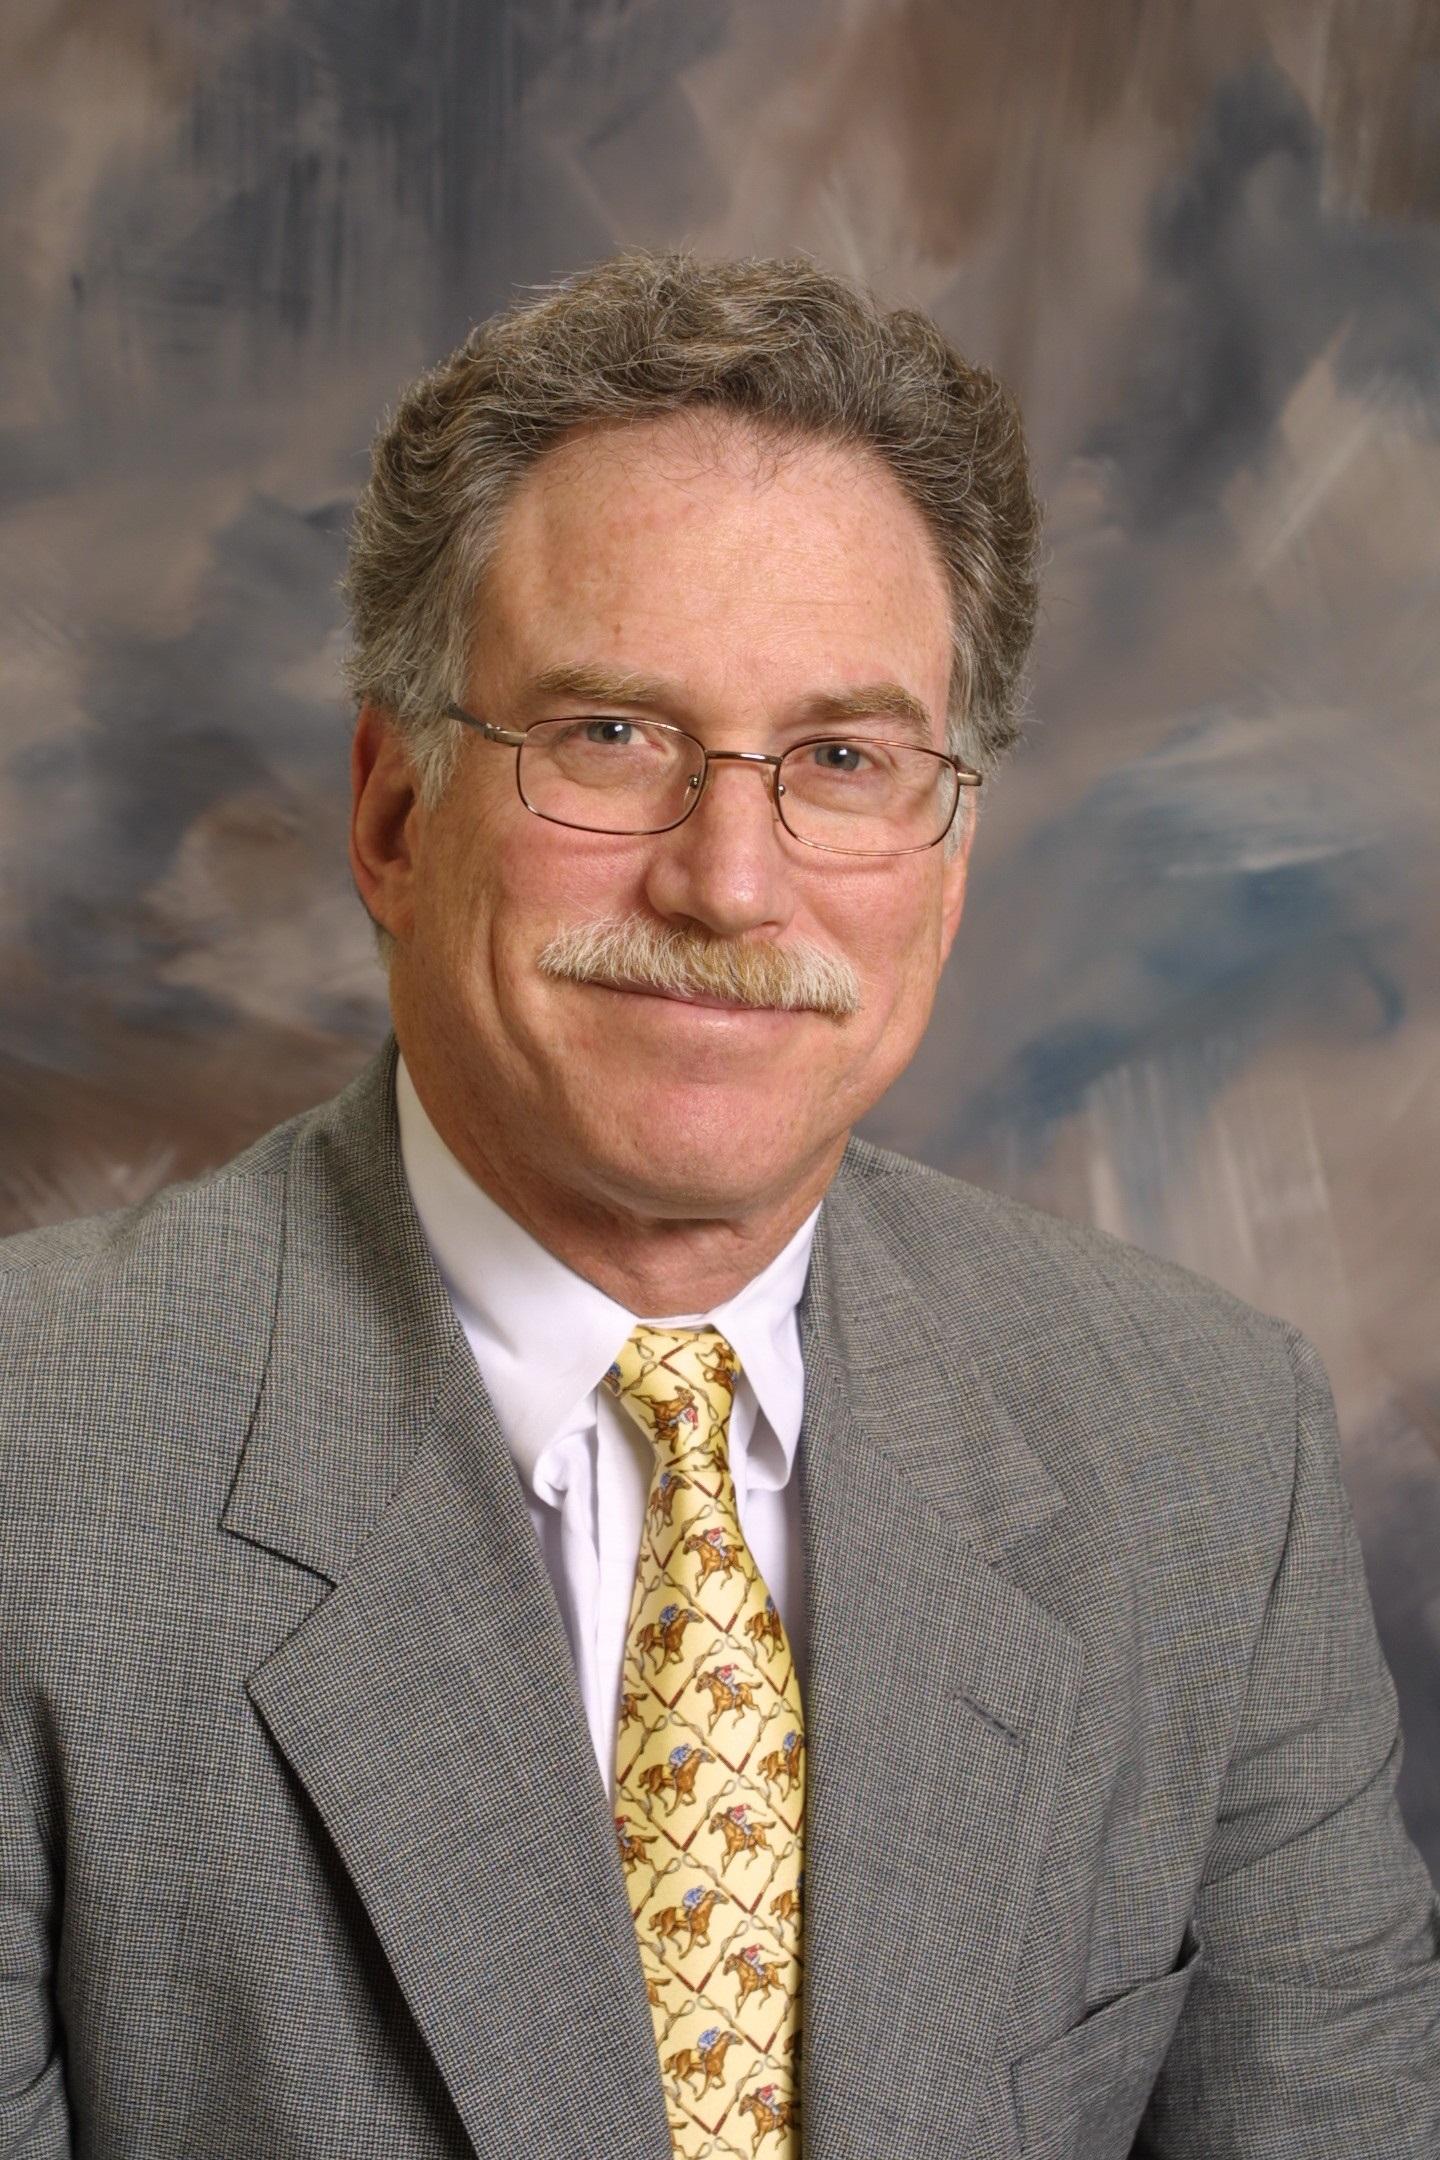 Morton J. Kern